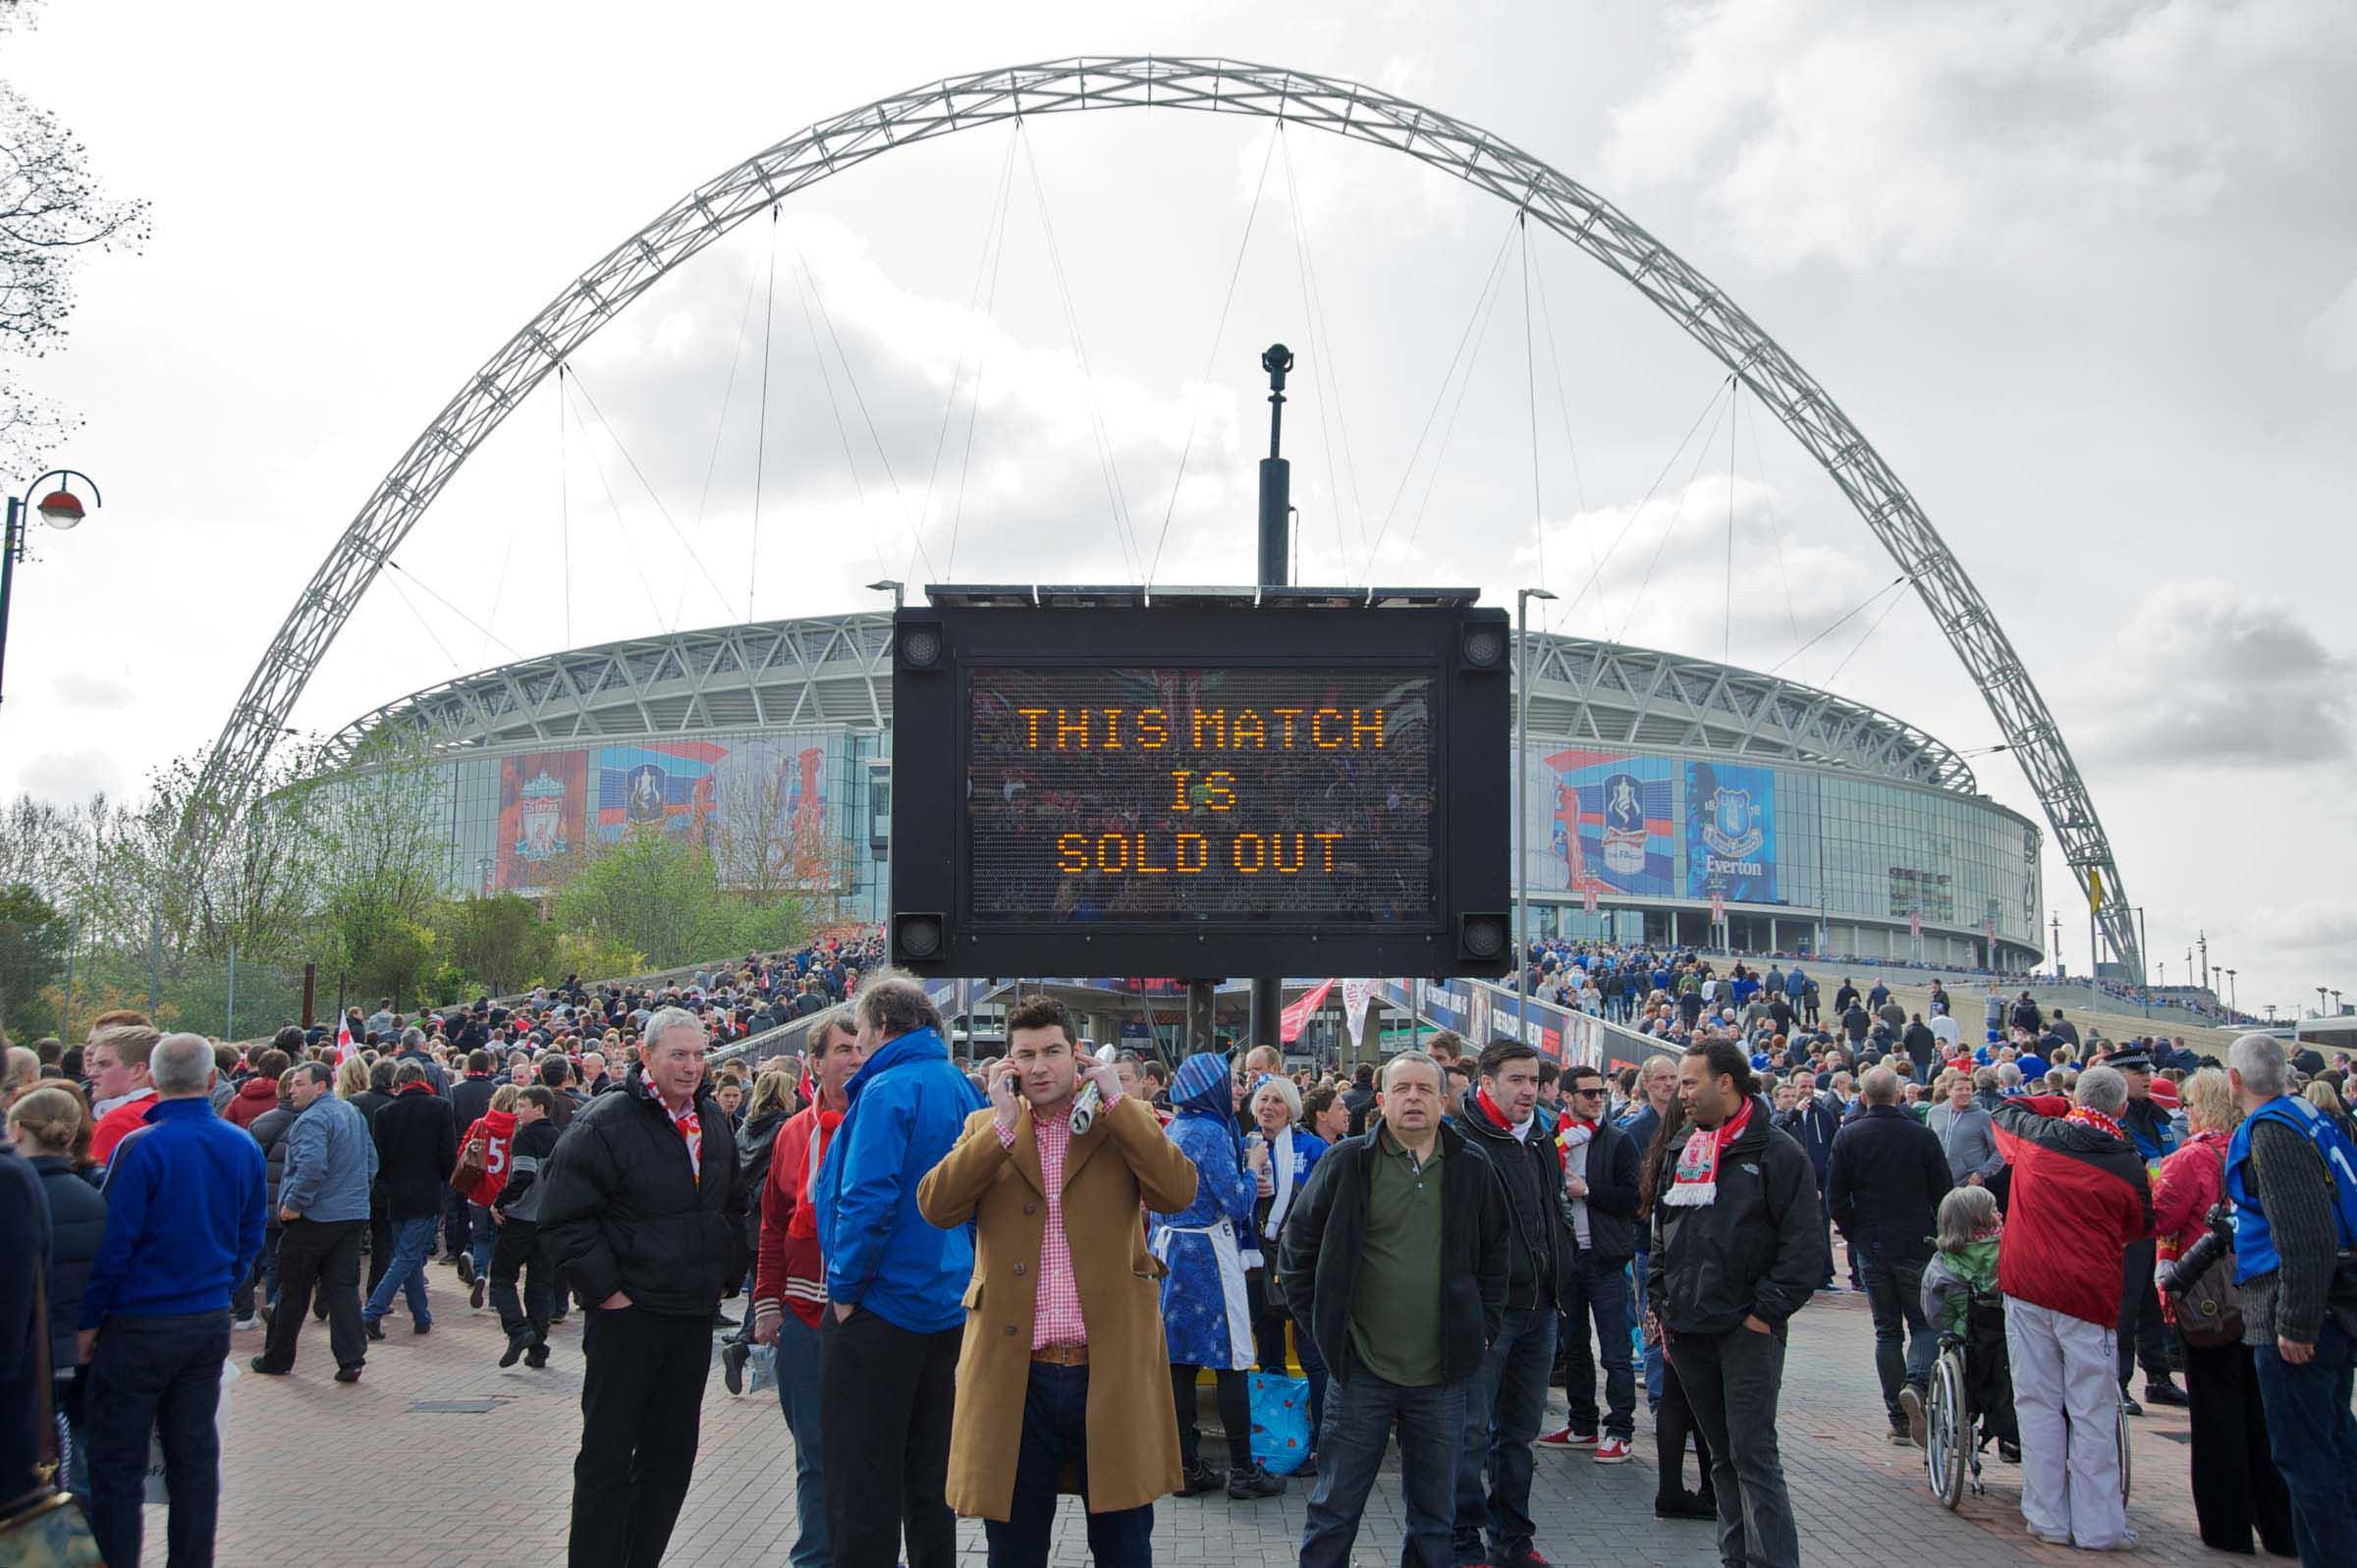 Liverpool Fans Outside Wembley